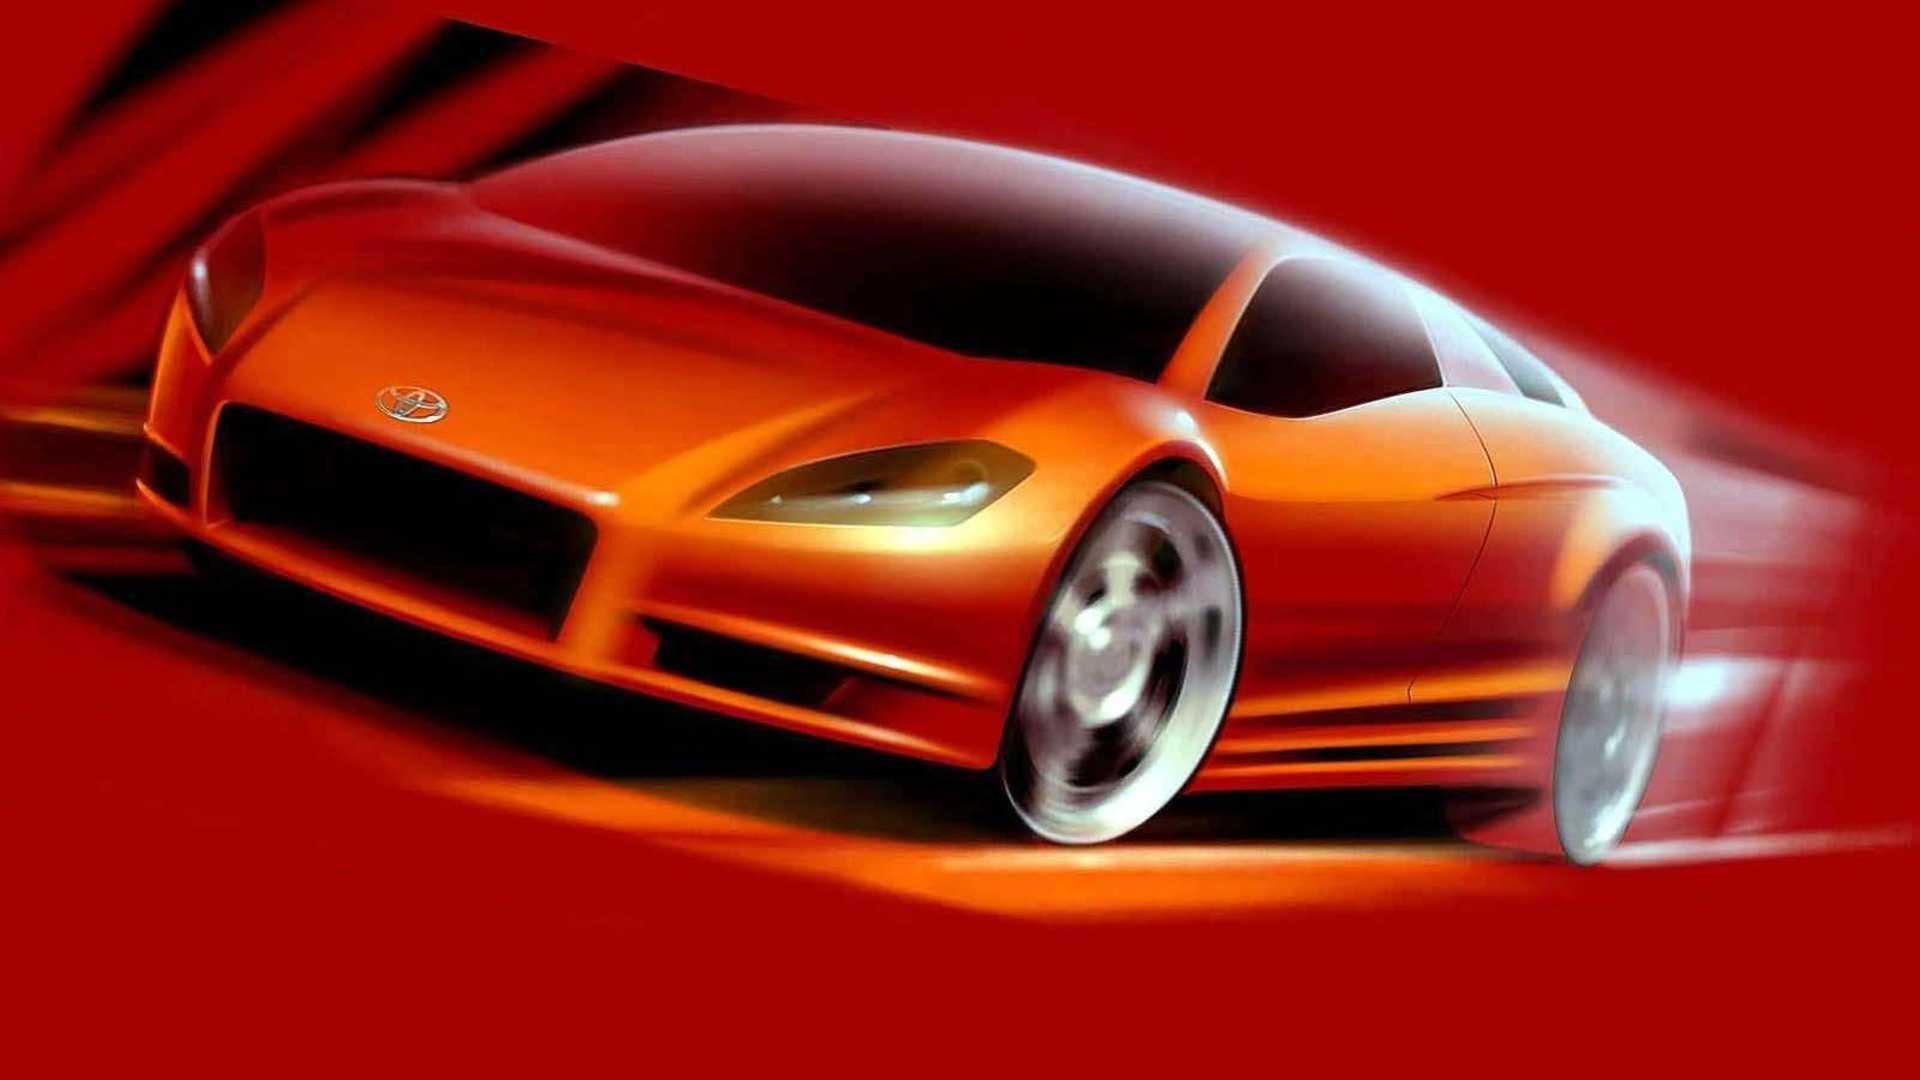 Toyota-Alessandro-Volta-concept-2004-25